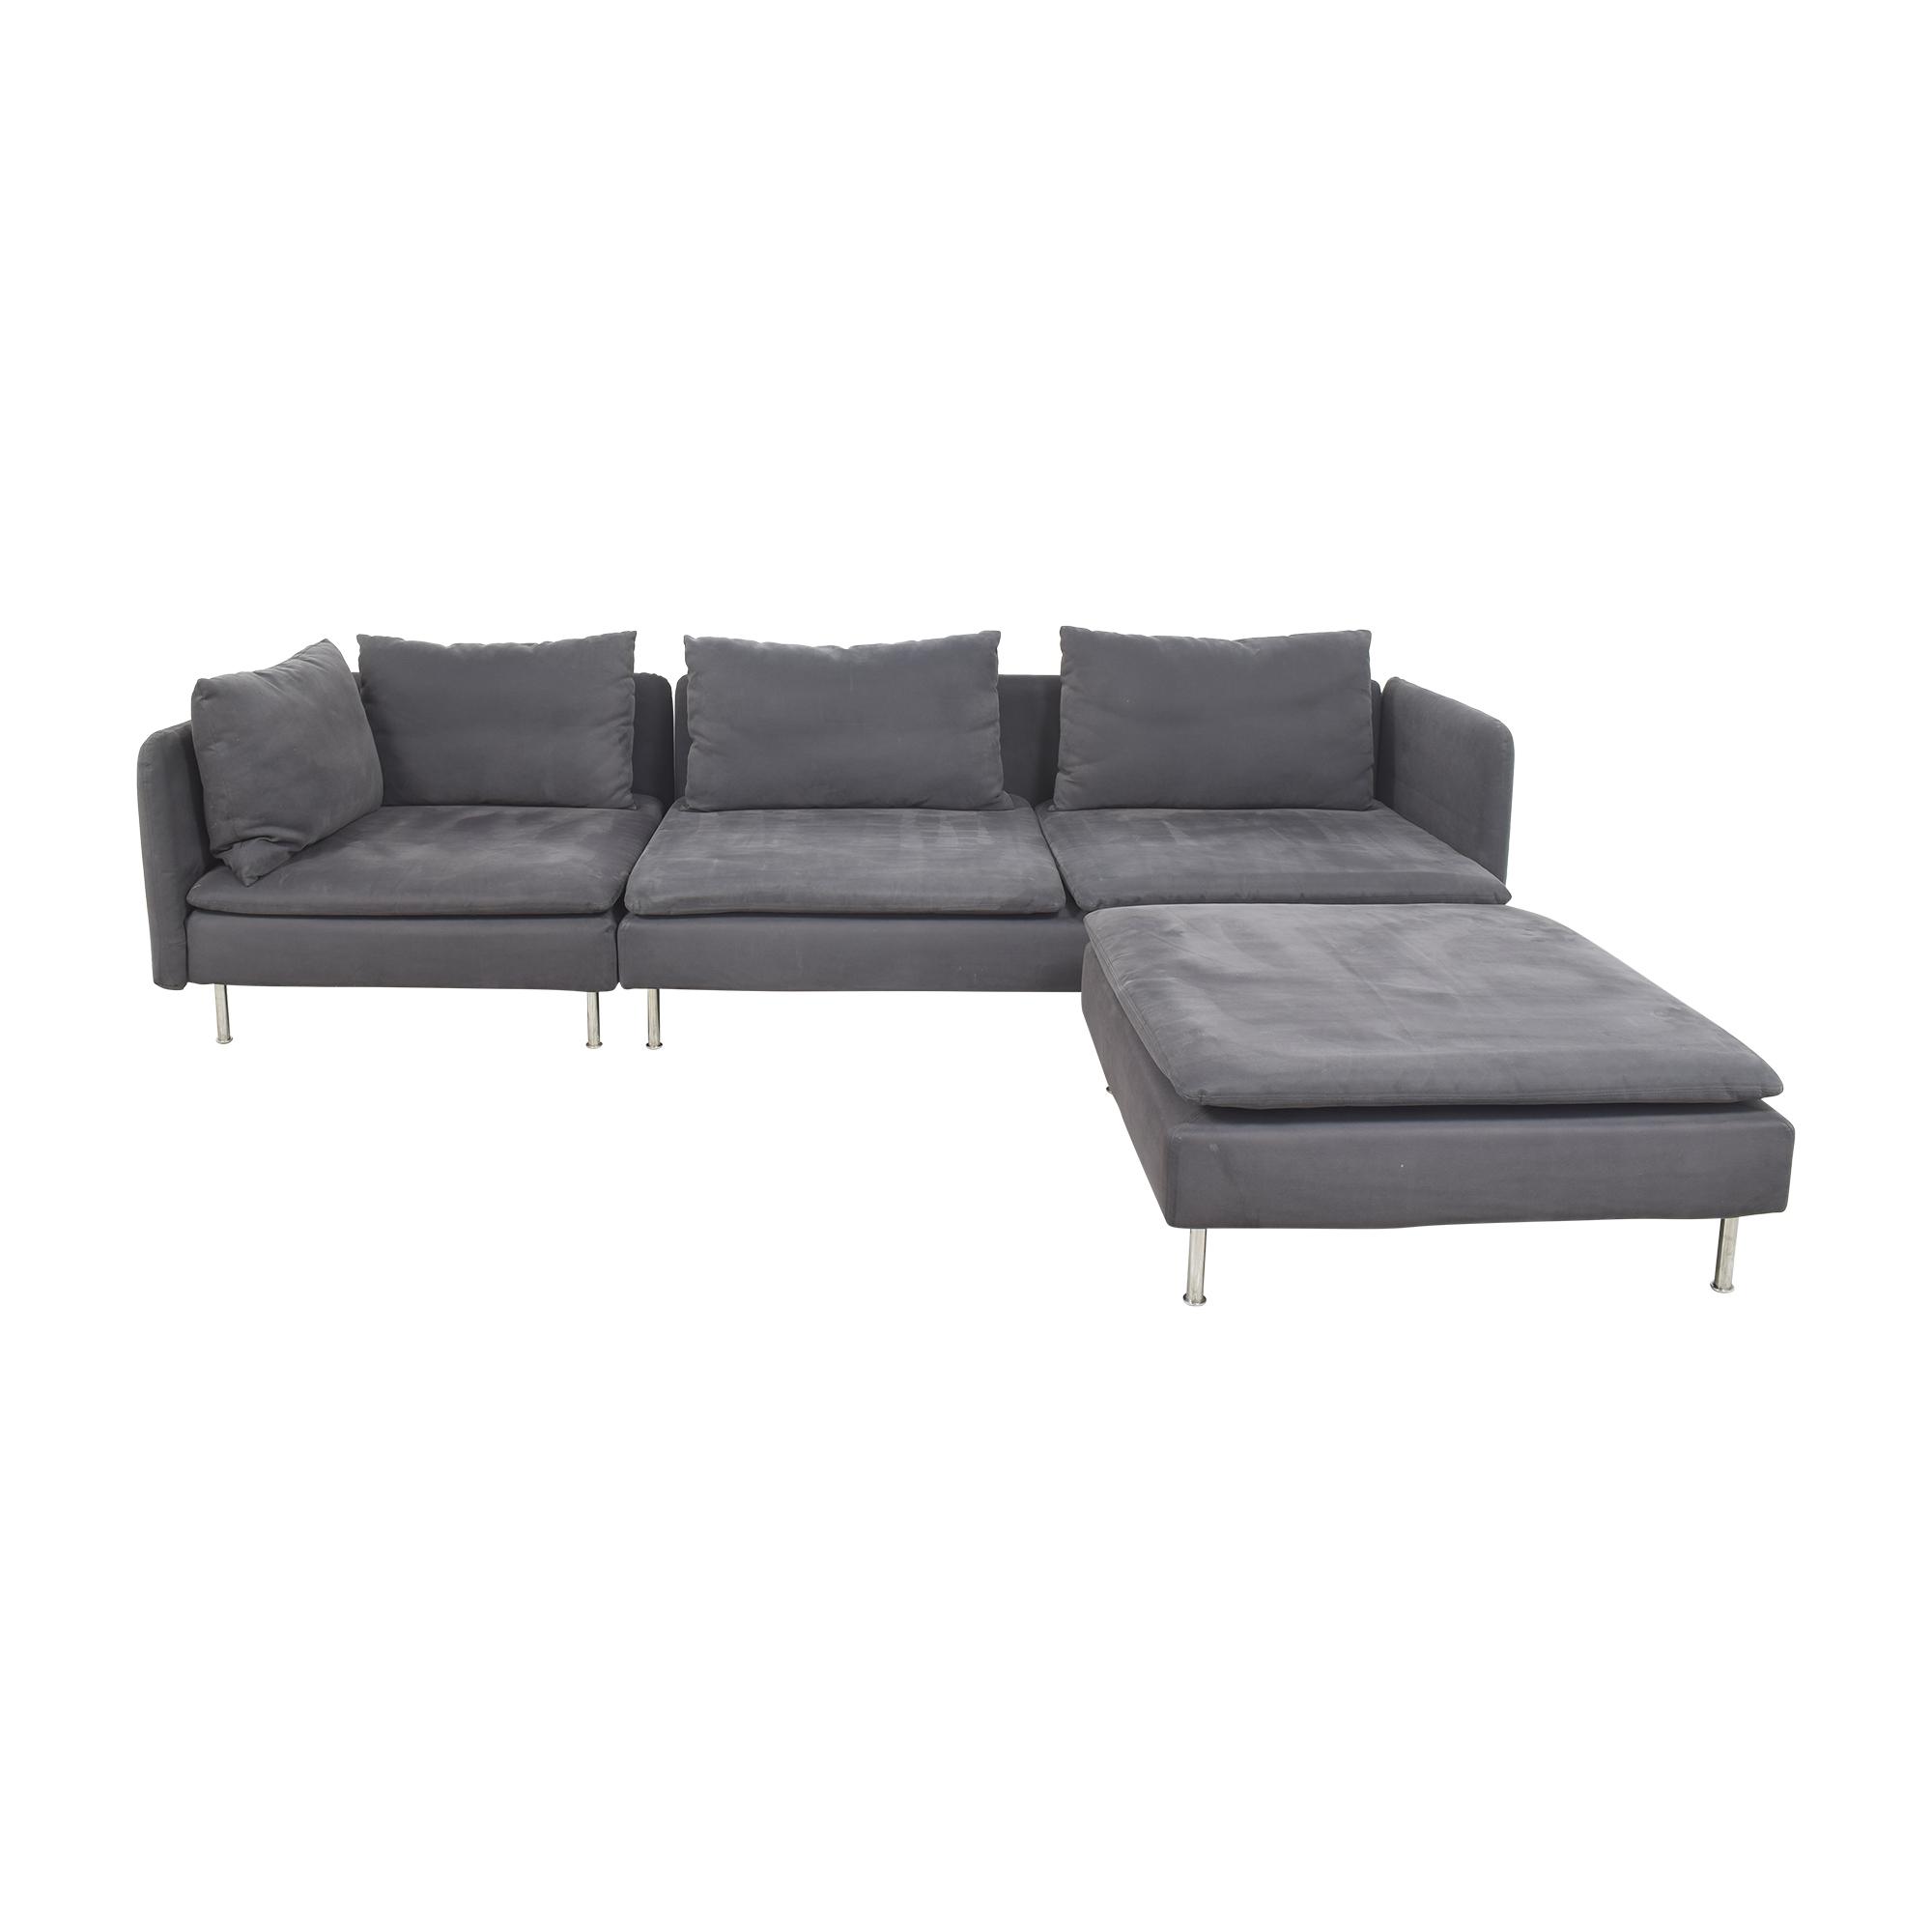 IKEA IKEA SÖDERHAMN Sectional Sofa with Ottoman dark grey